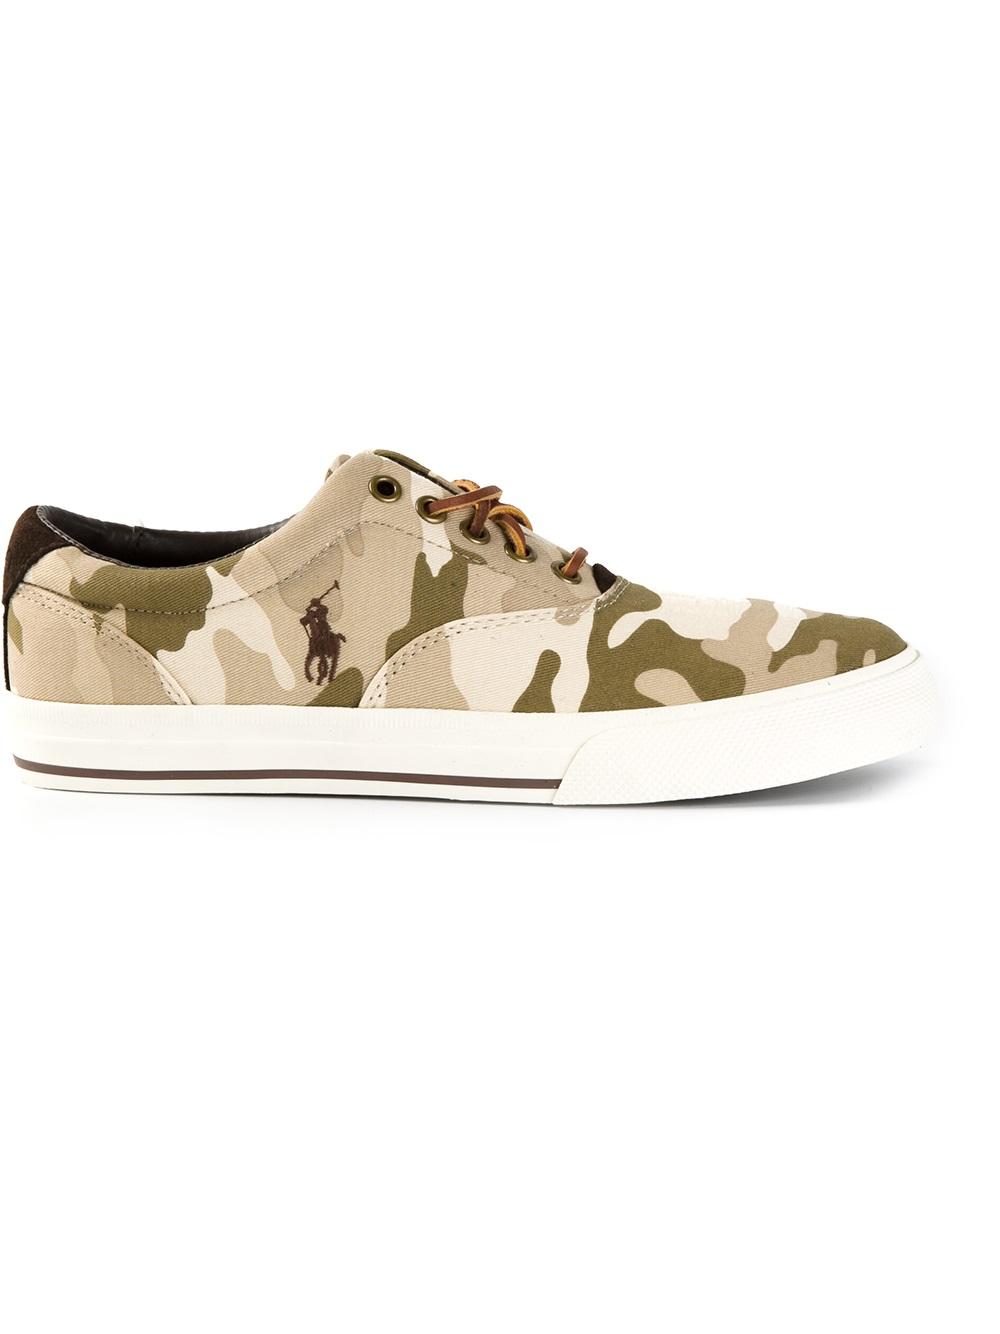 Polo Ralph Lauren Camouflage Sneakers In Green For Men Lyst